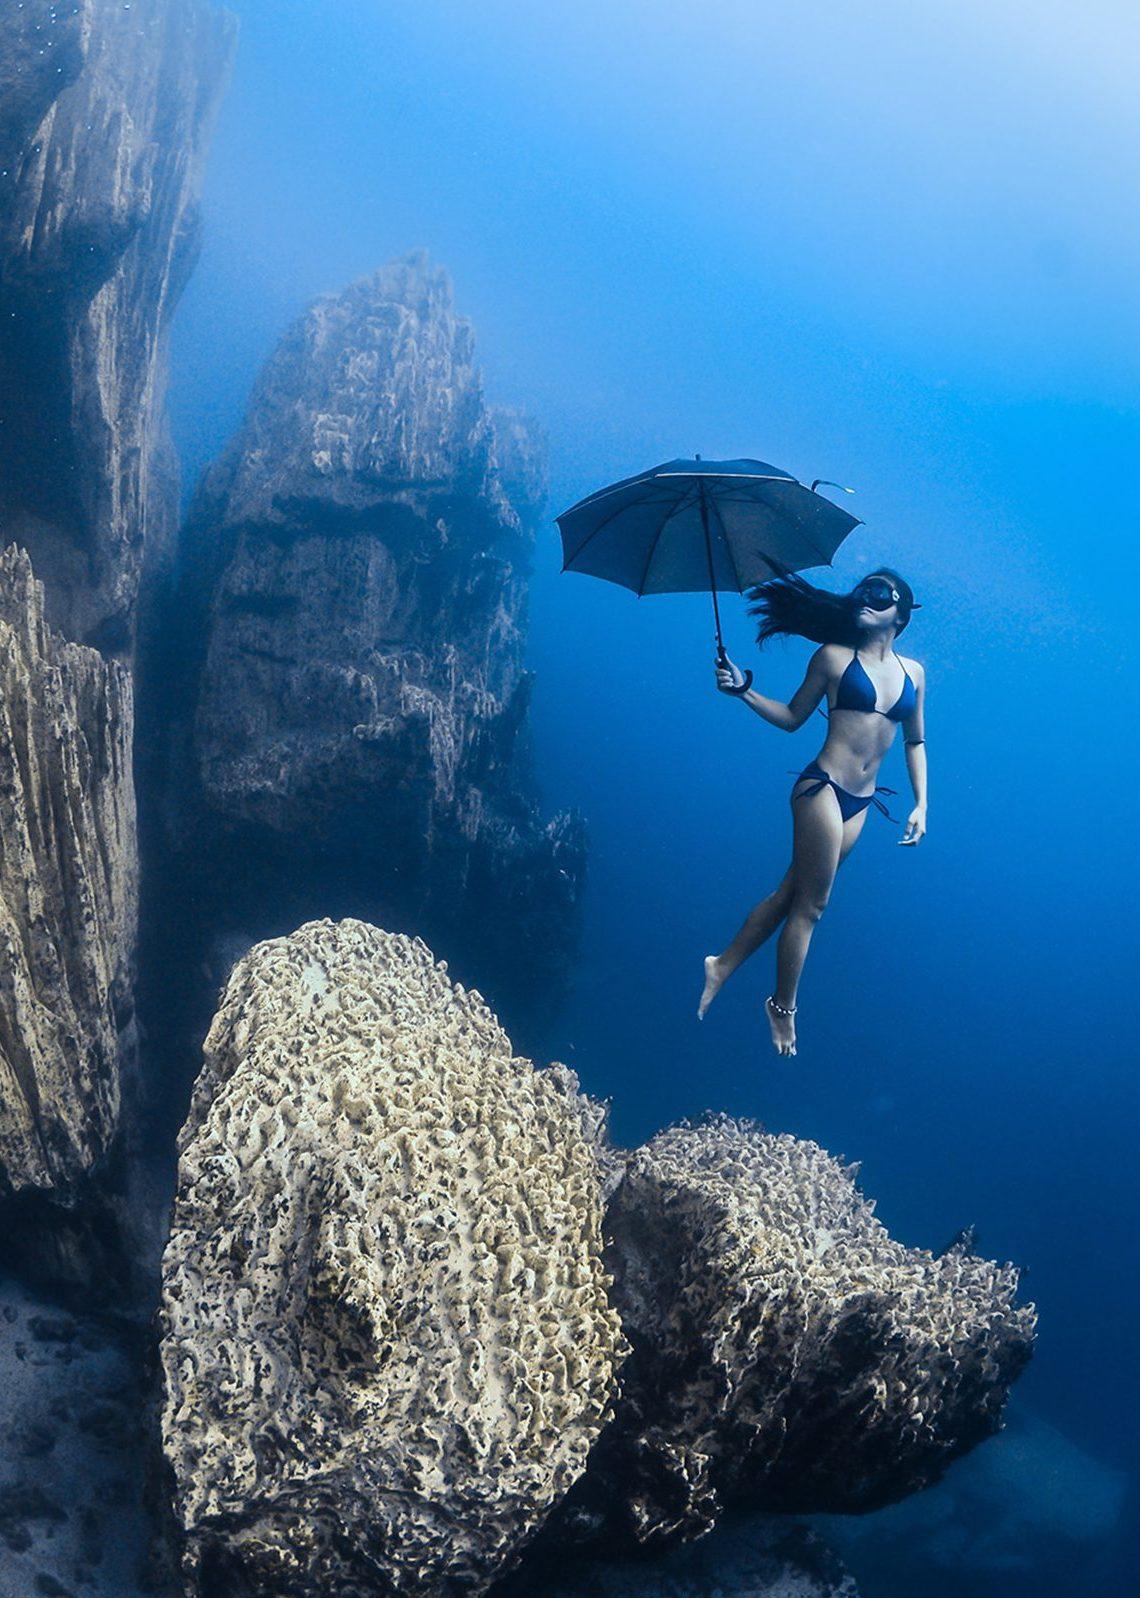 Winners From the 2016 Ocean Art Underwater Photo Contest